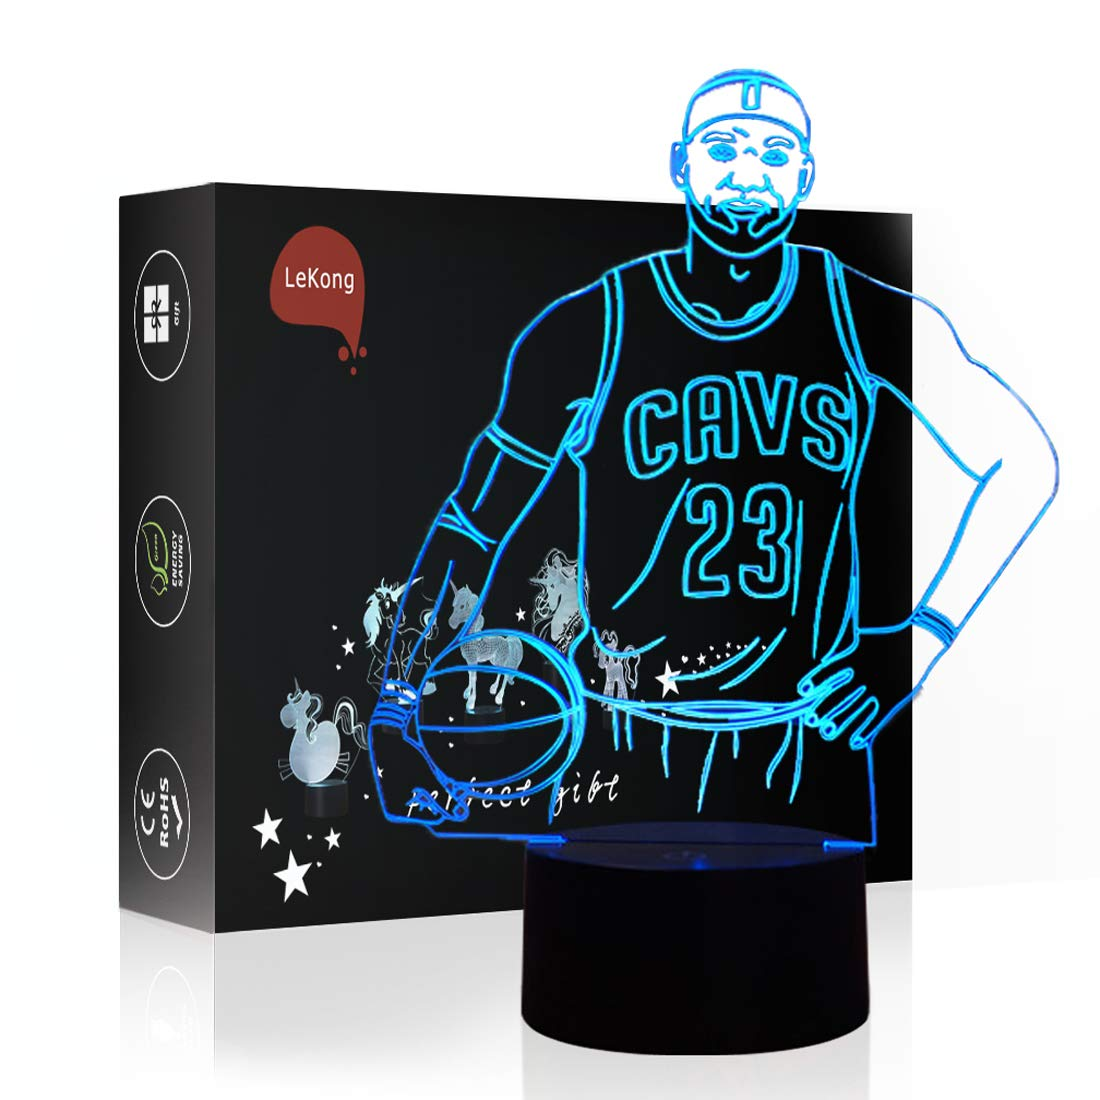 Basketball Toy LEDNightLampforKids3DIllusion,LeKong USBPlugin, TouchControl,GiftforThanksgiving &Friendship, FitforHomeDecorations